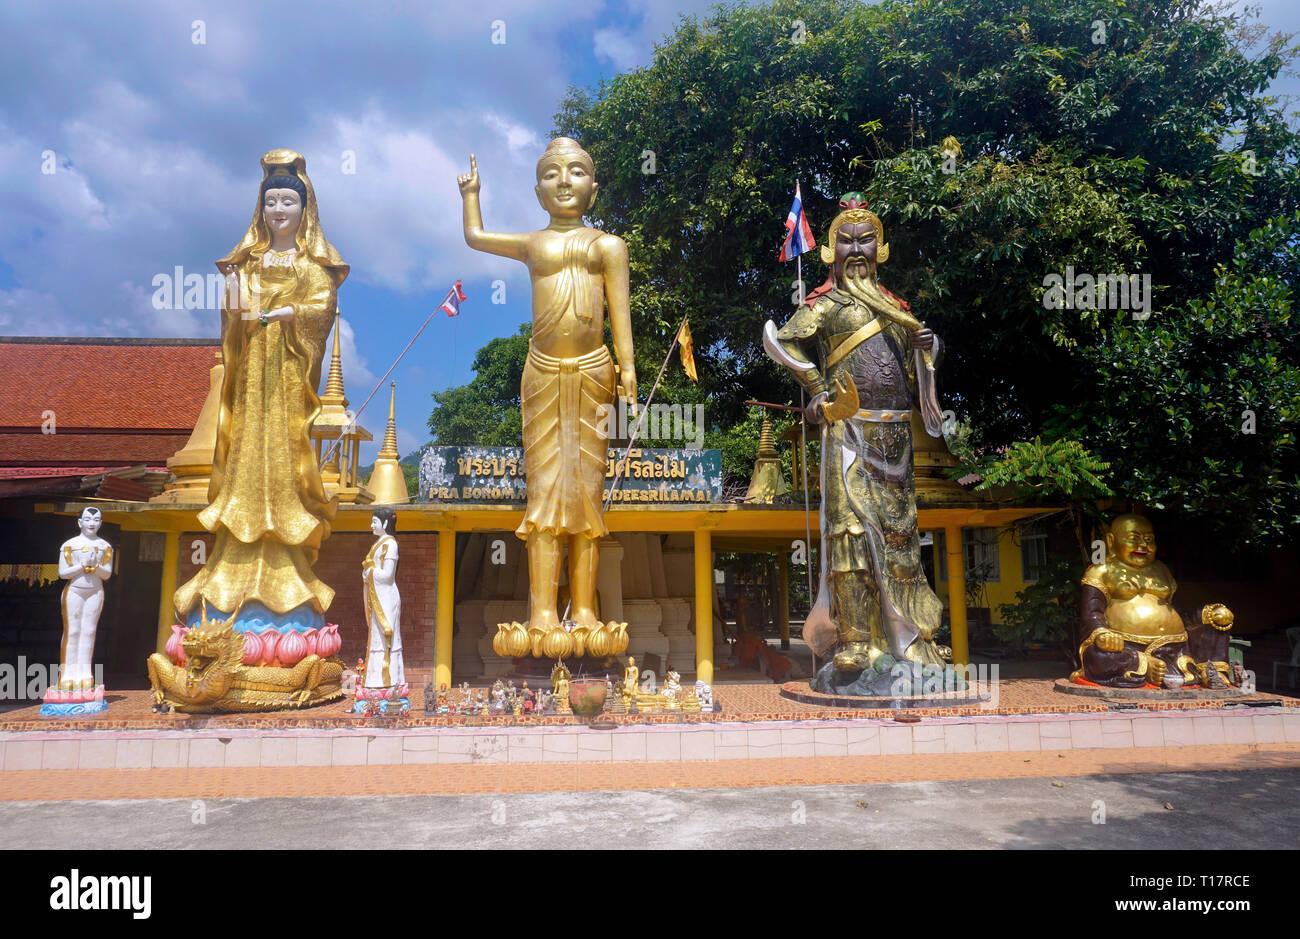 Buddhist statues at the entrance of Wat Lamai Temple, Folklore Museum at Lamai center, Koh Samui, Surat Thani, Gulf of Thailand, Thailand - Stock Image